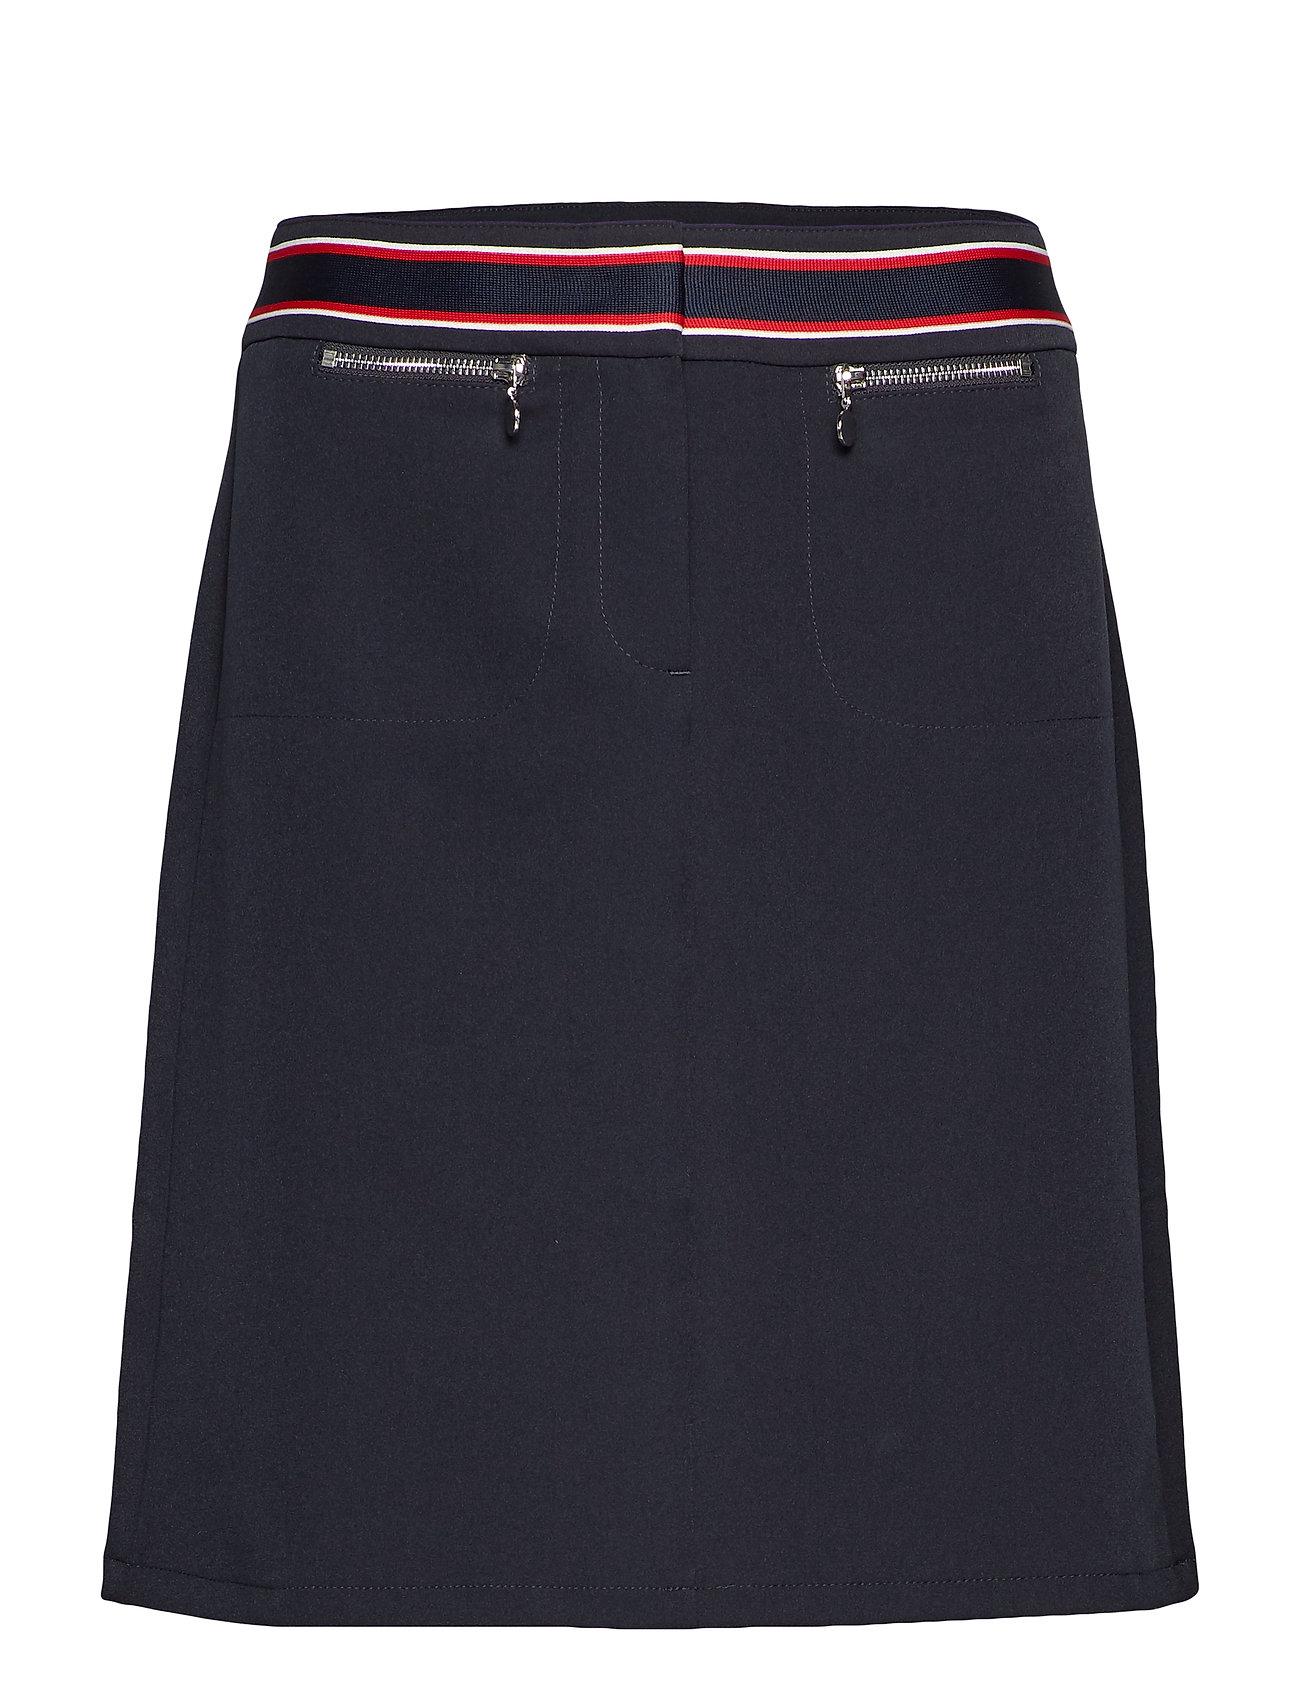 Short FamarineTaifun Skirt Woven Woven Skirt Short nwOmNv08